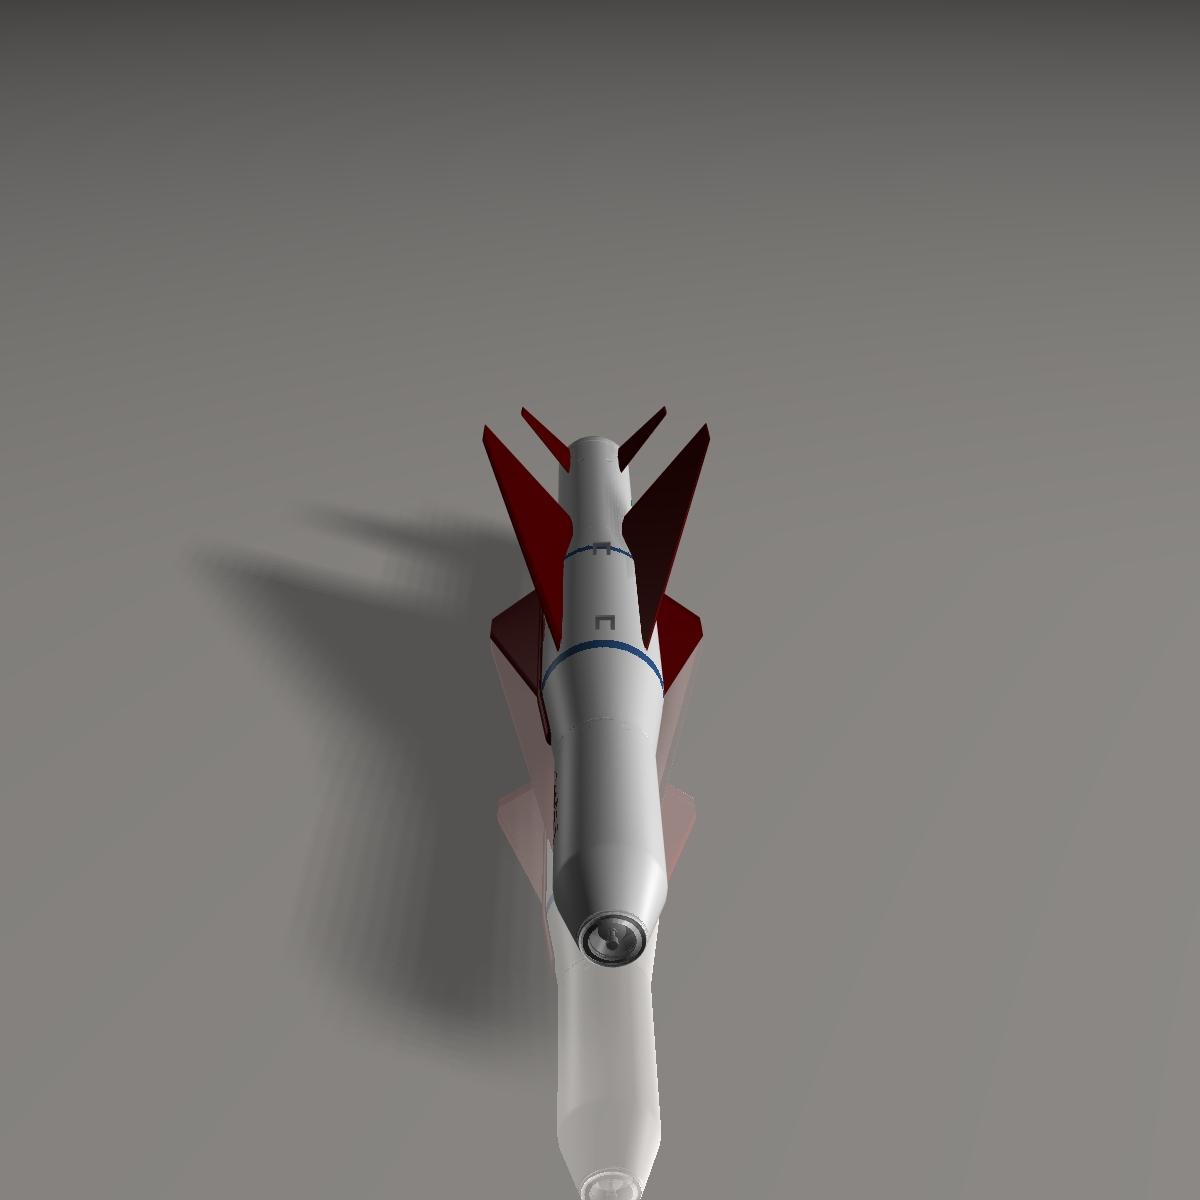 iranian agm-379 zoobin asm missile 3d model 3ds dxf fbx blend cob dae x obj 150585